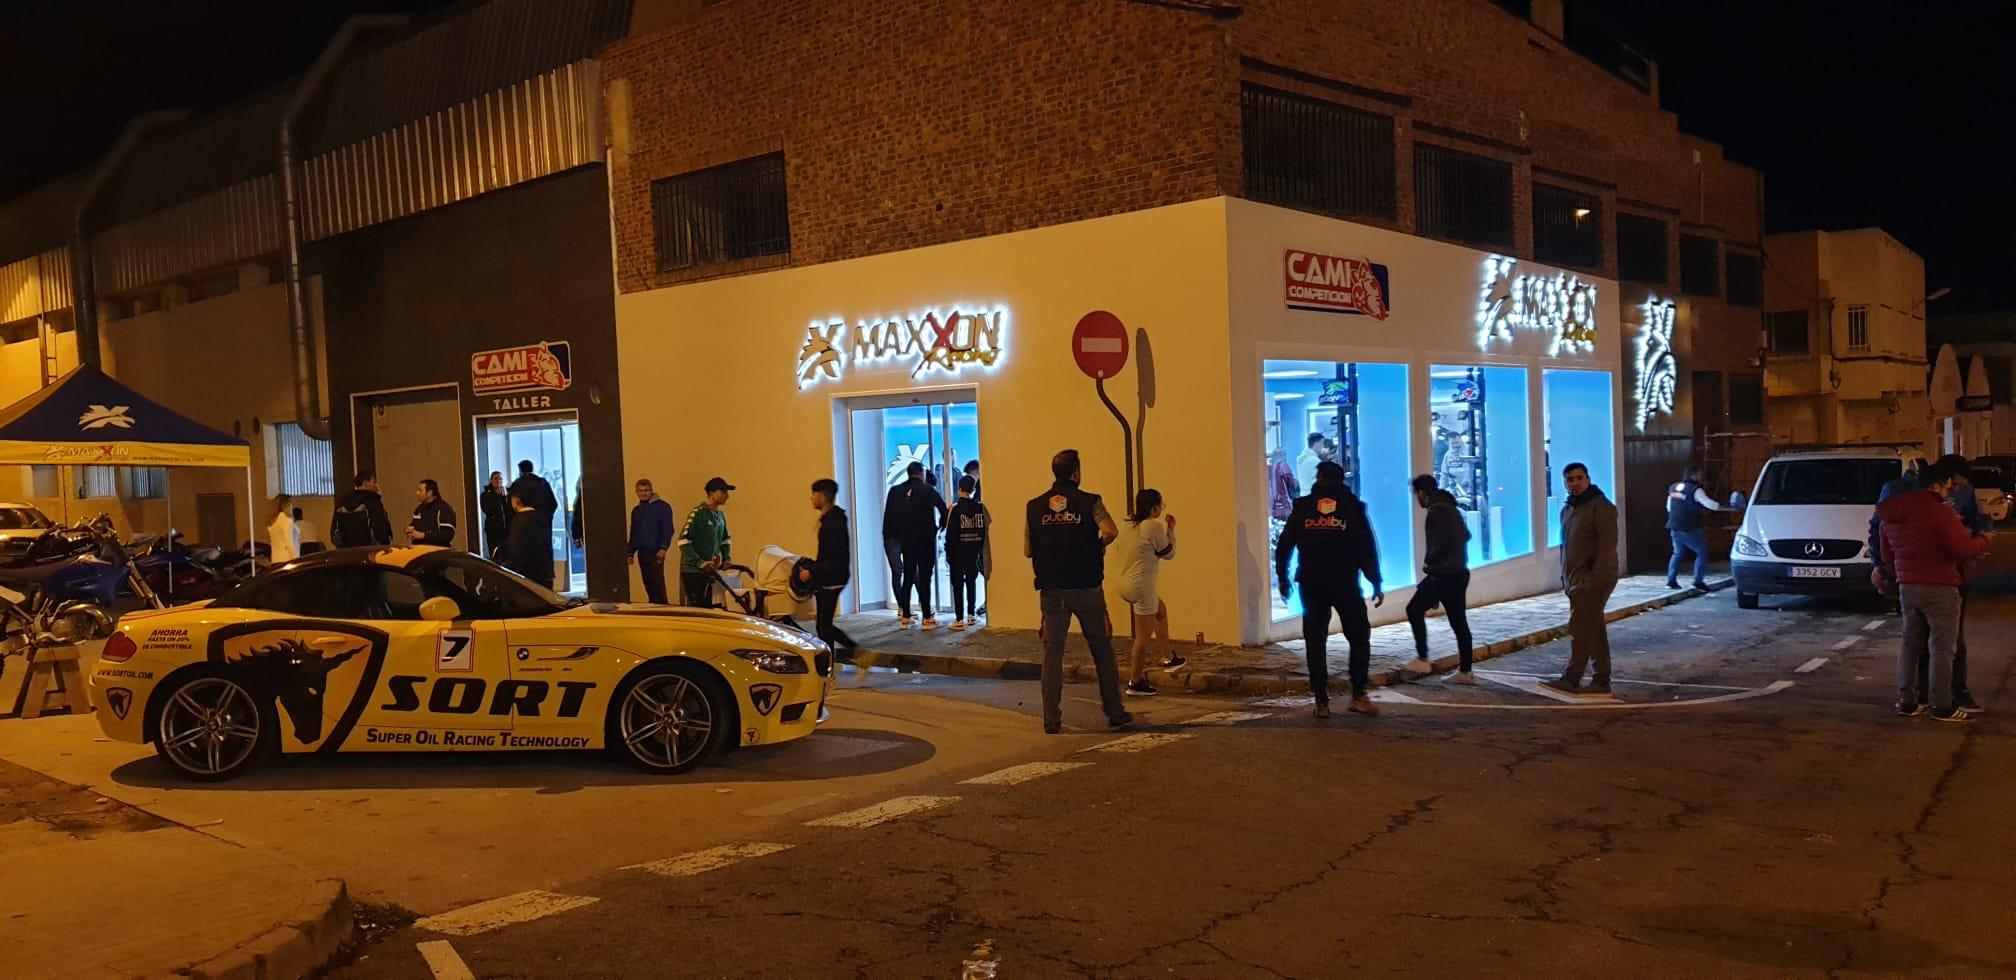 Exteriores de la tienda de Maxxon Racing